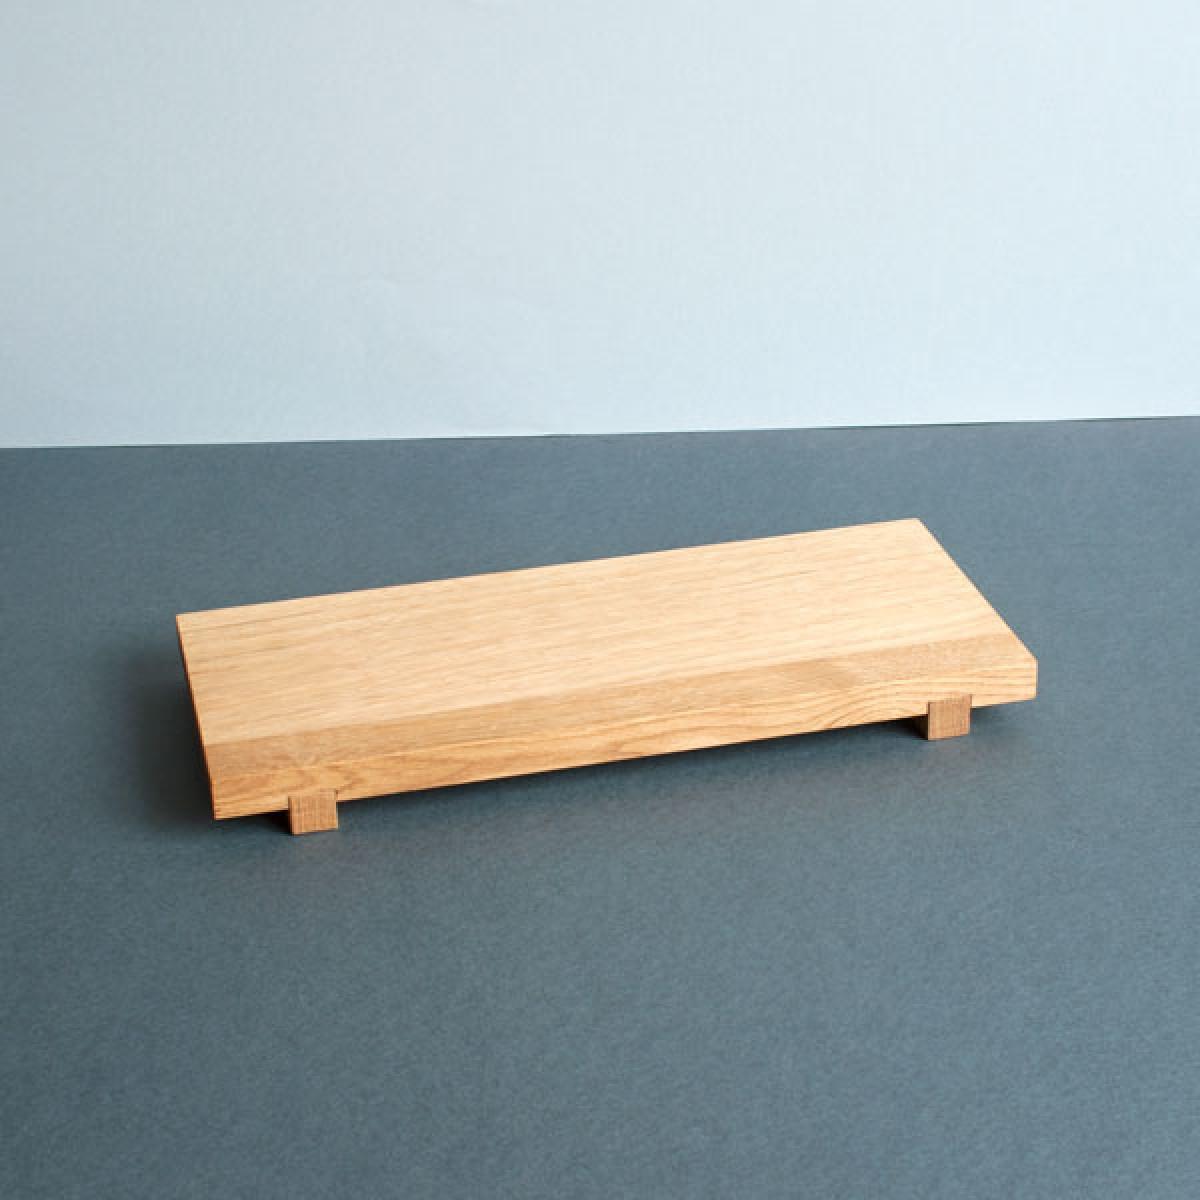 zita products - ENNA Tapasbrett klein